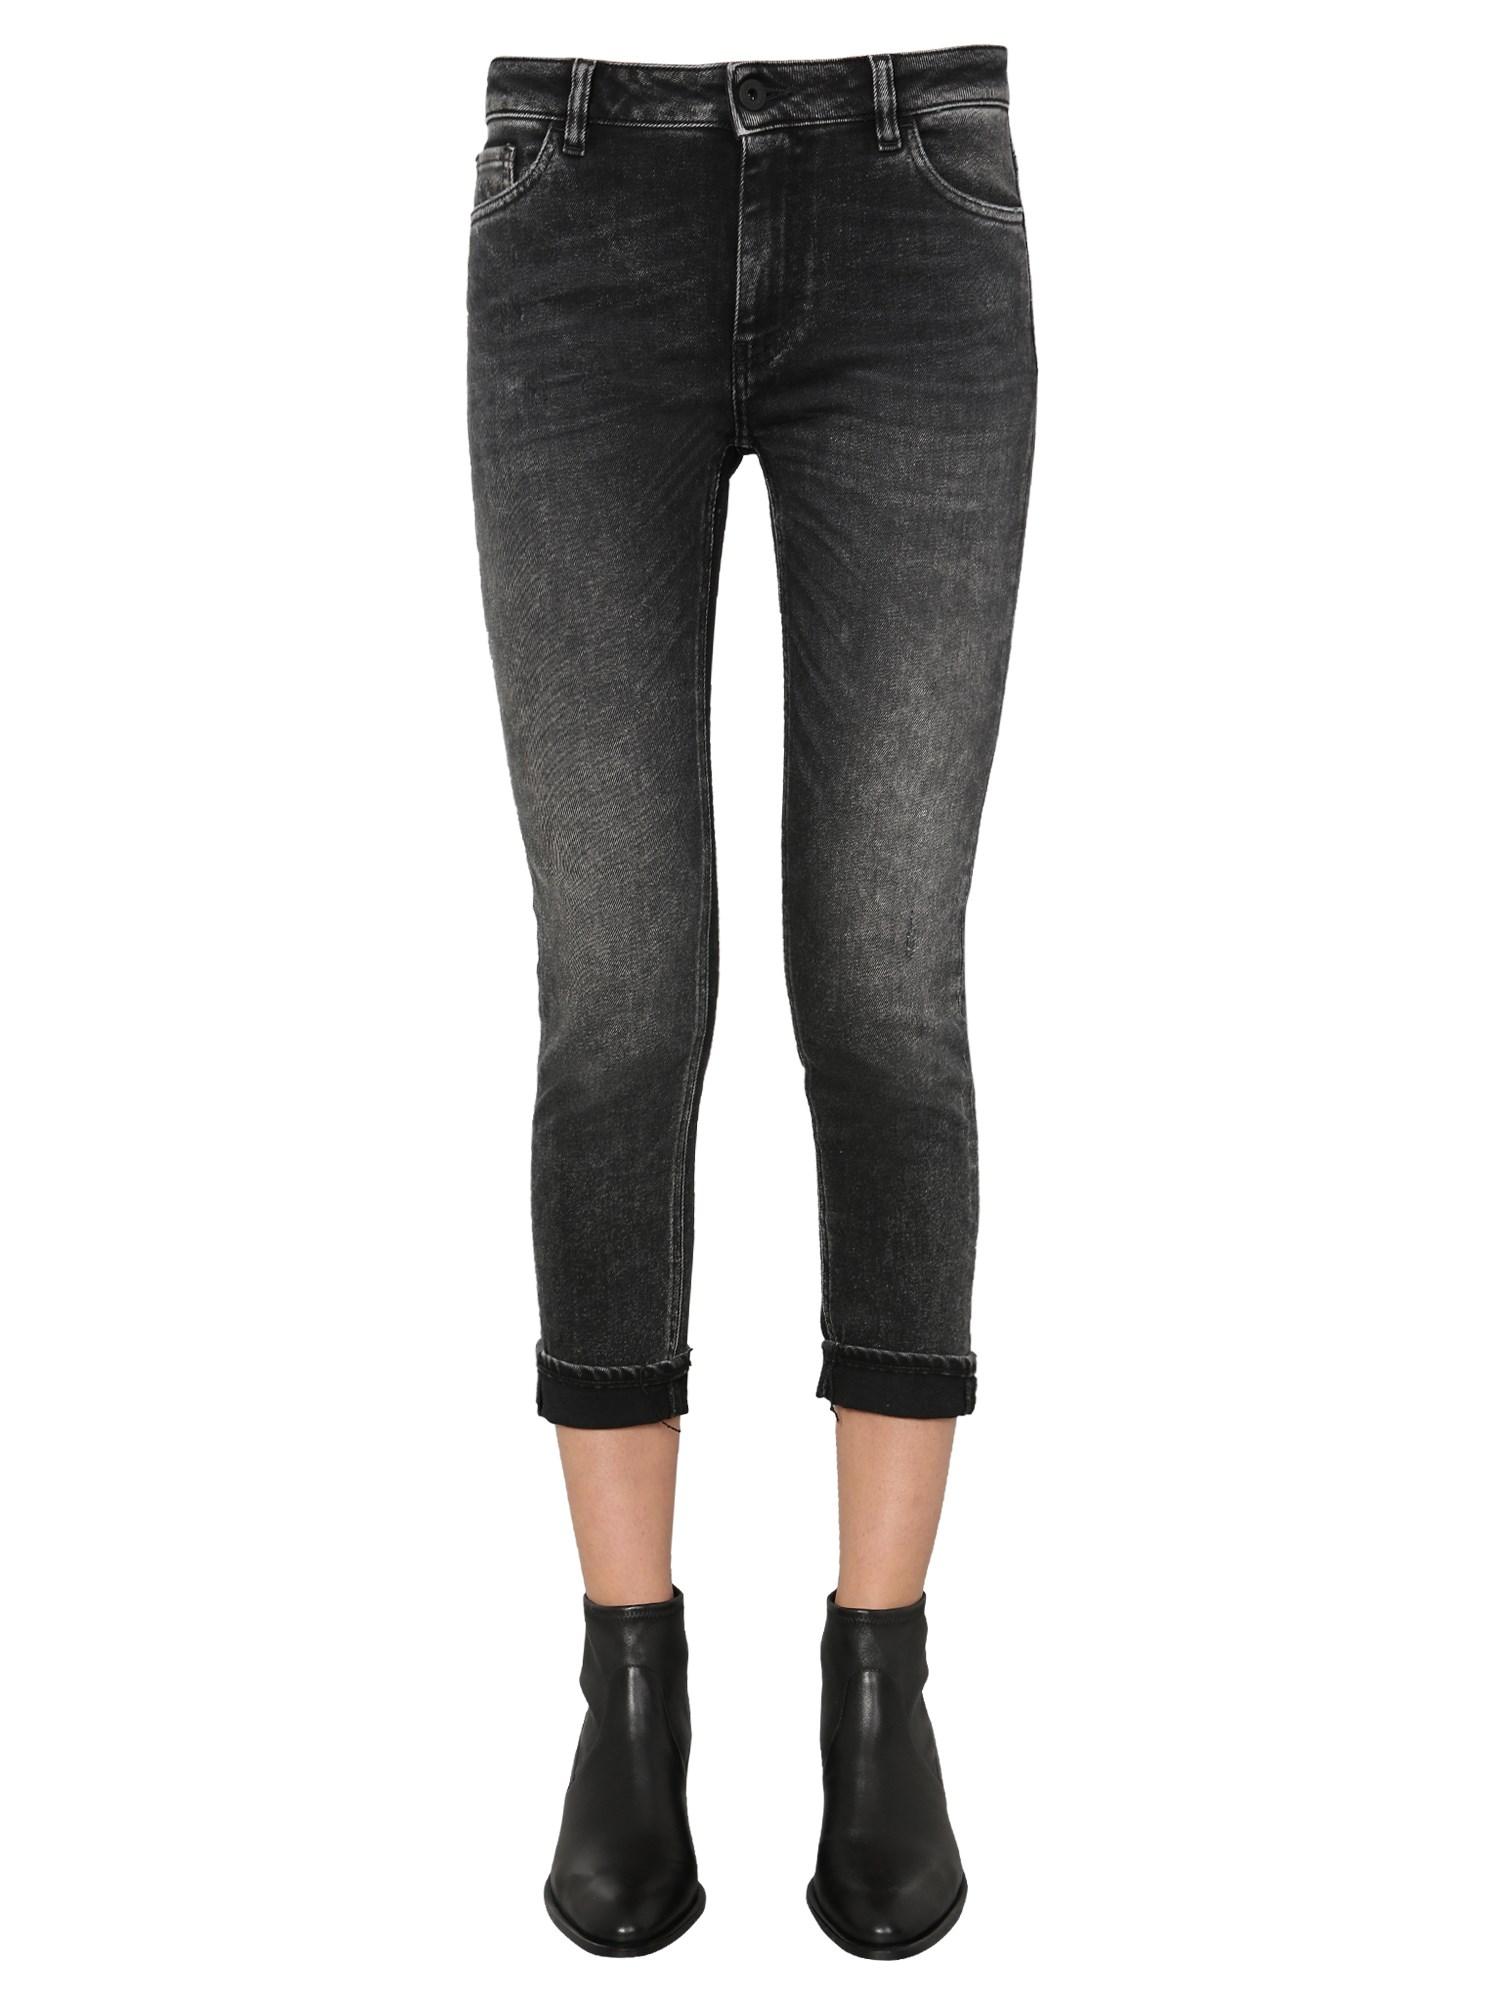 "pence 1979 ""edda"" jeans"